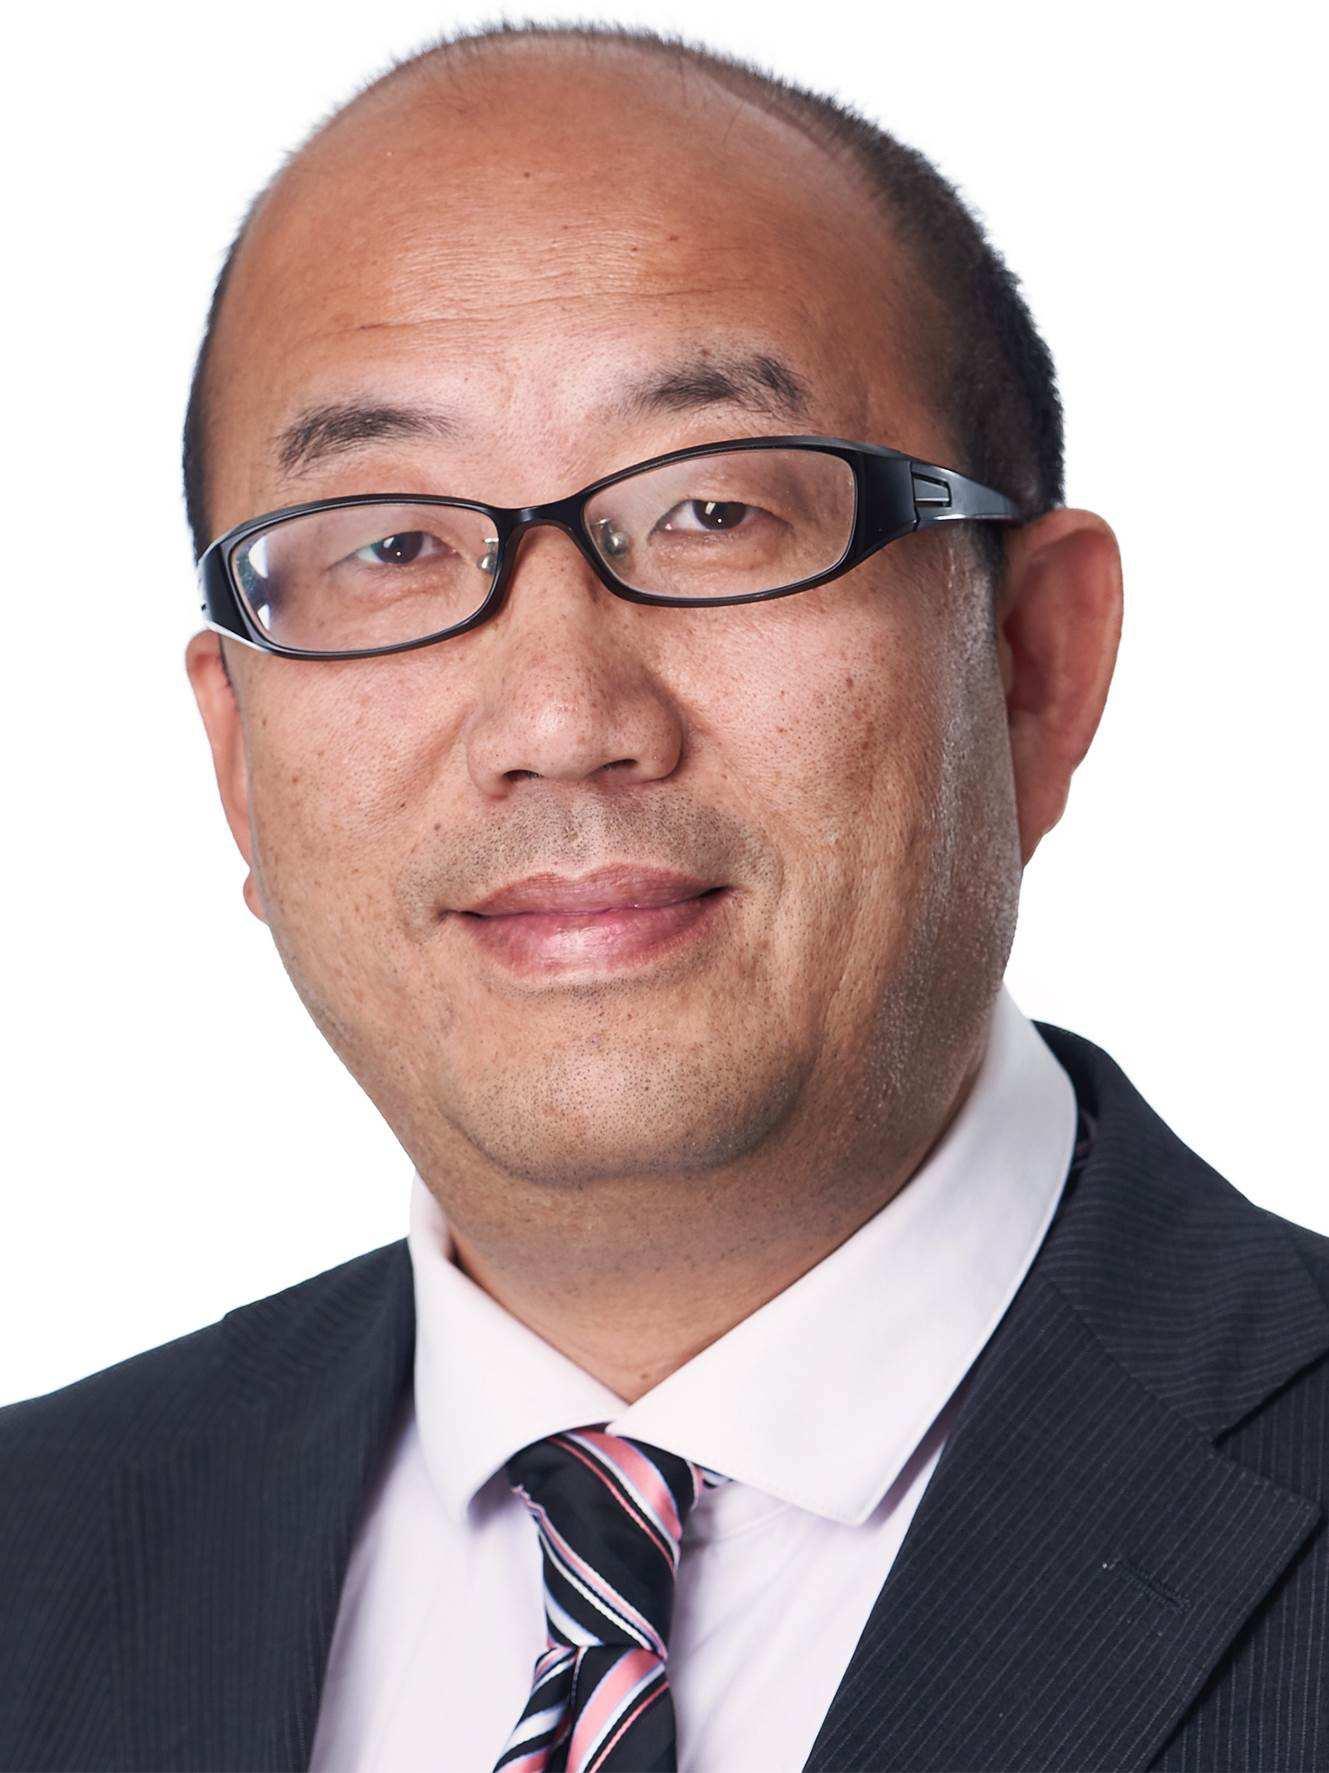 Alan Zhao